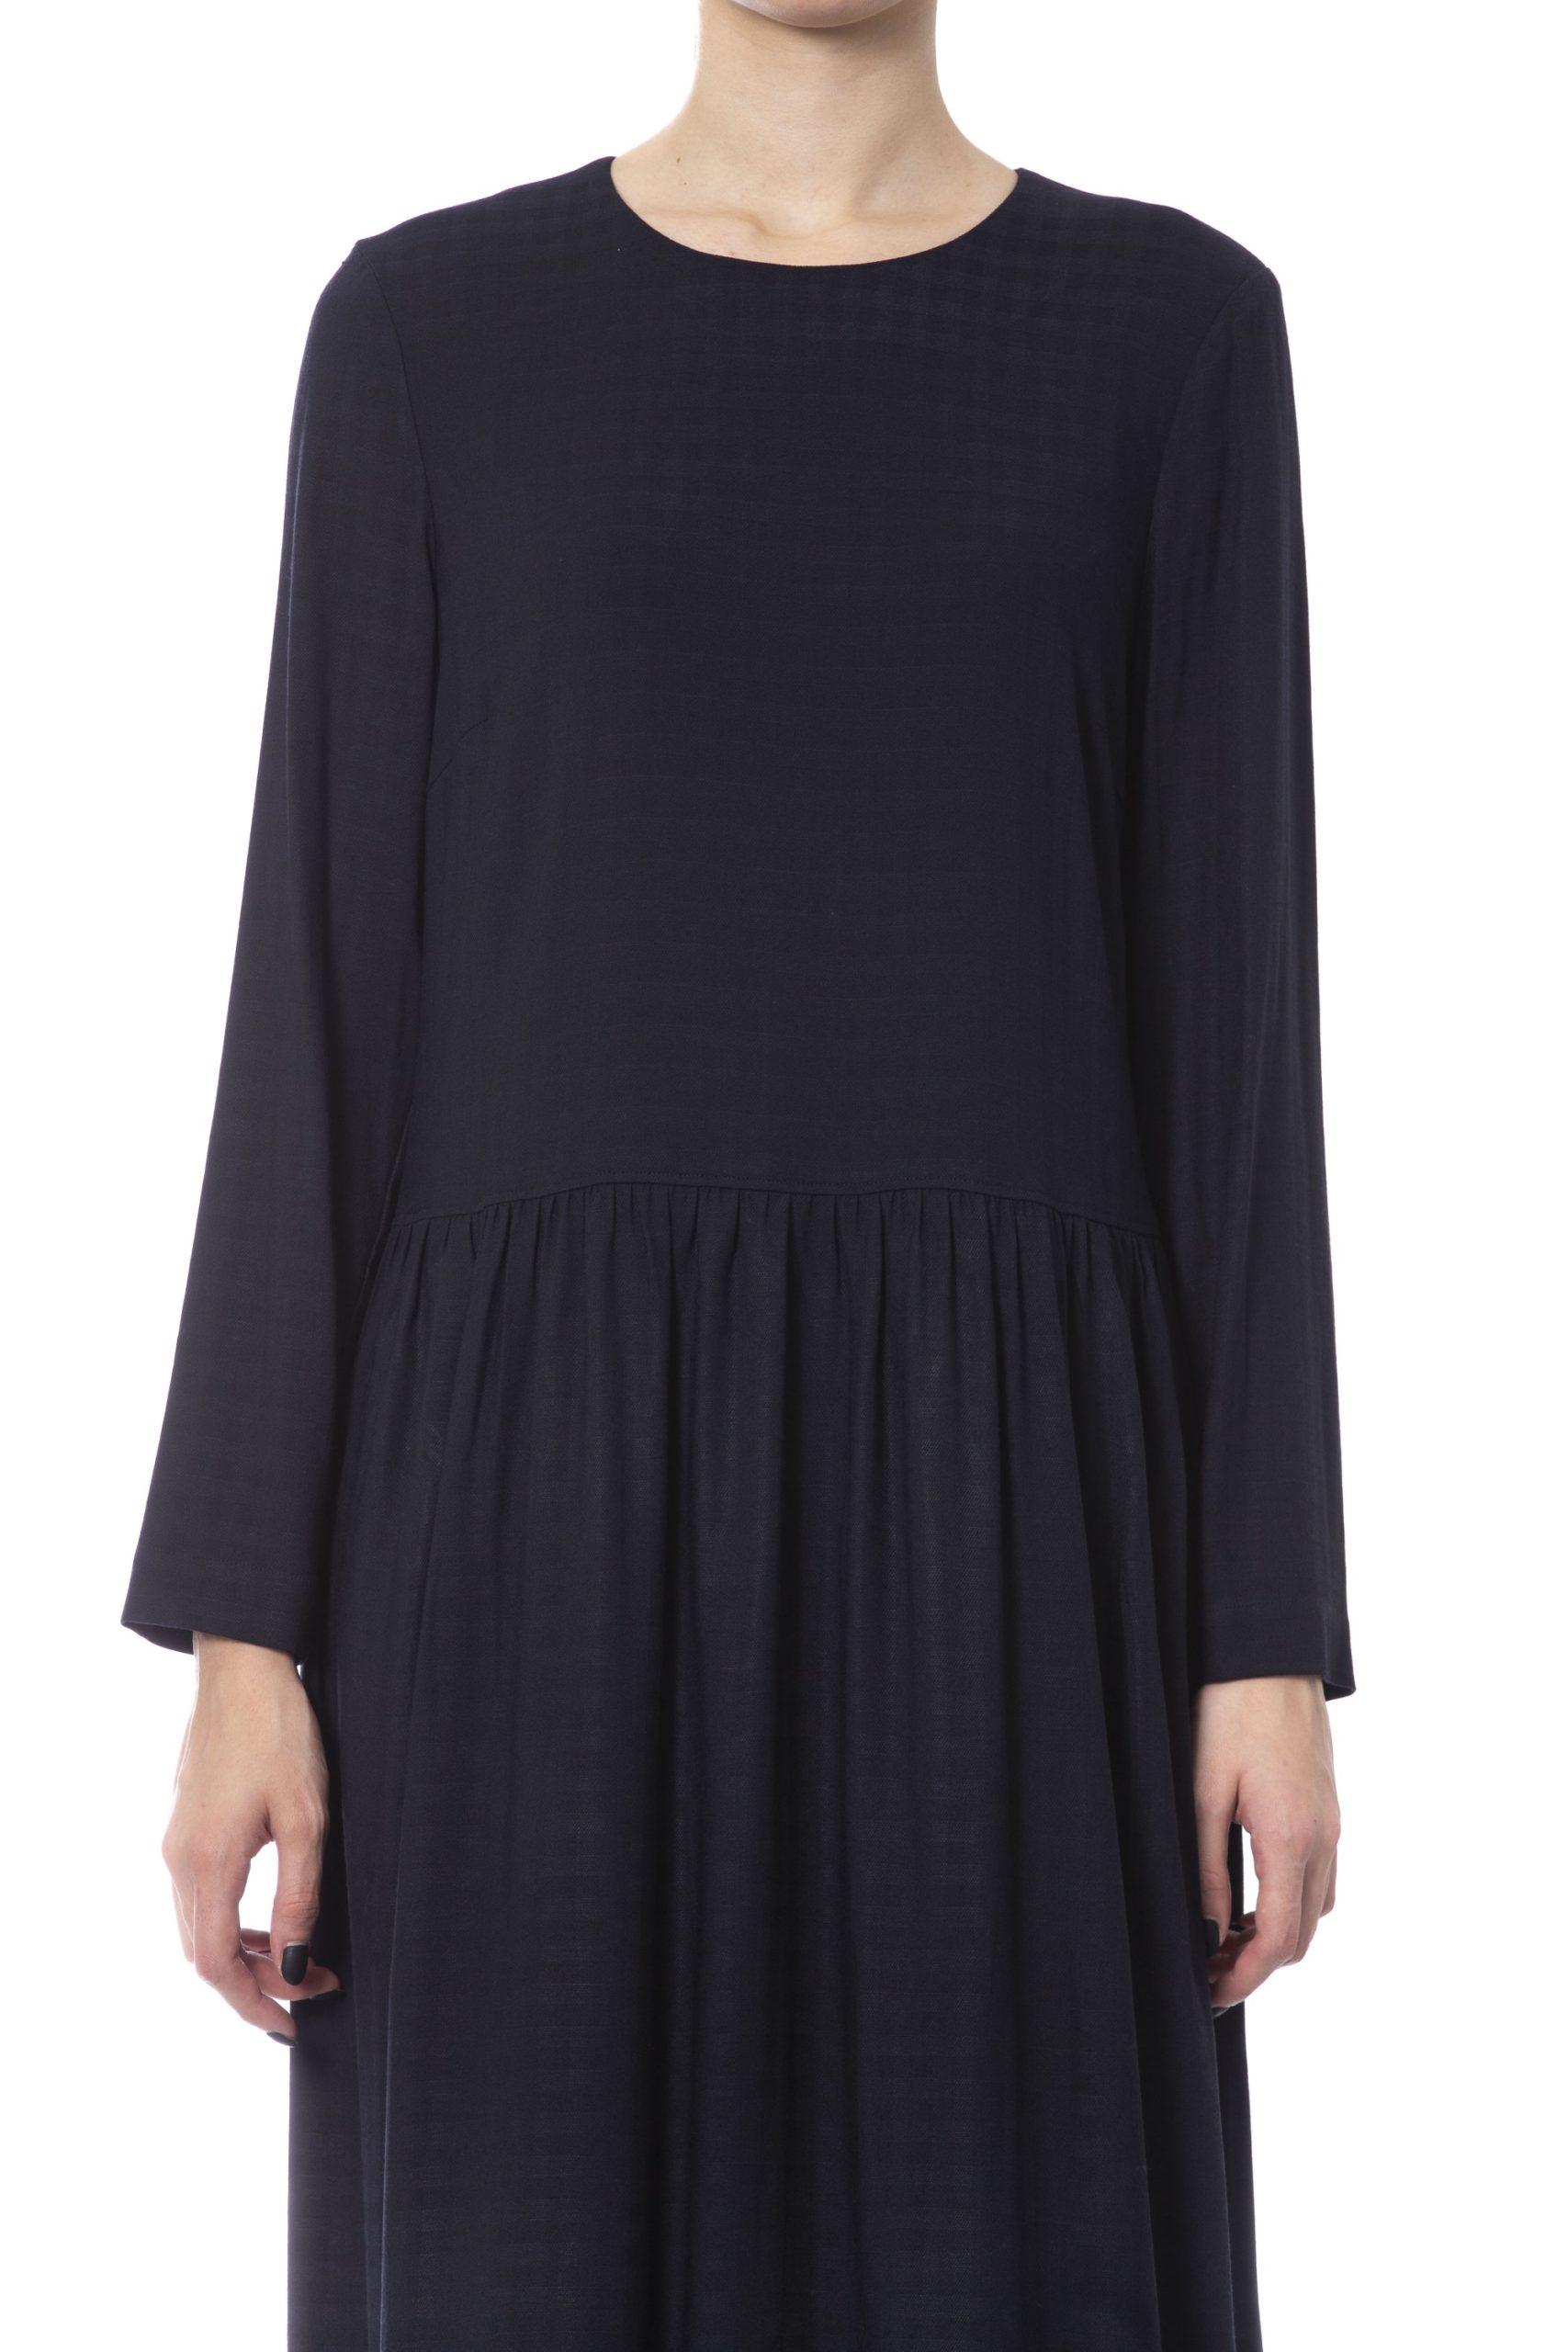 Peserico Women's Dress Blue PE994332 - IT42 | S